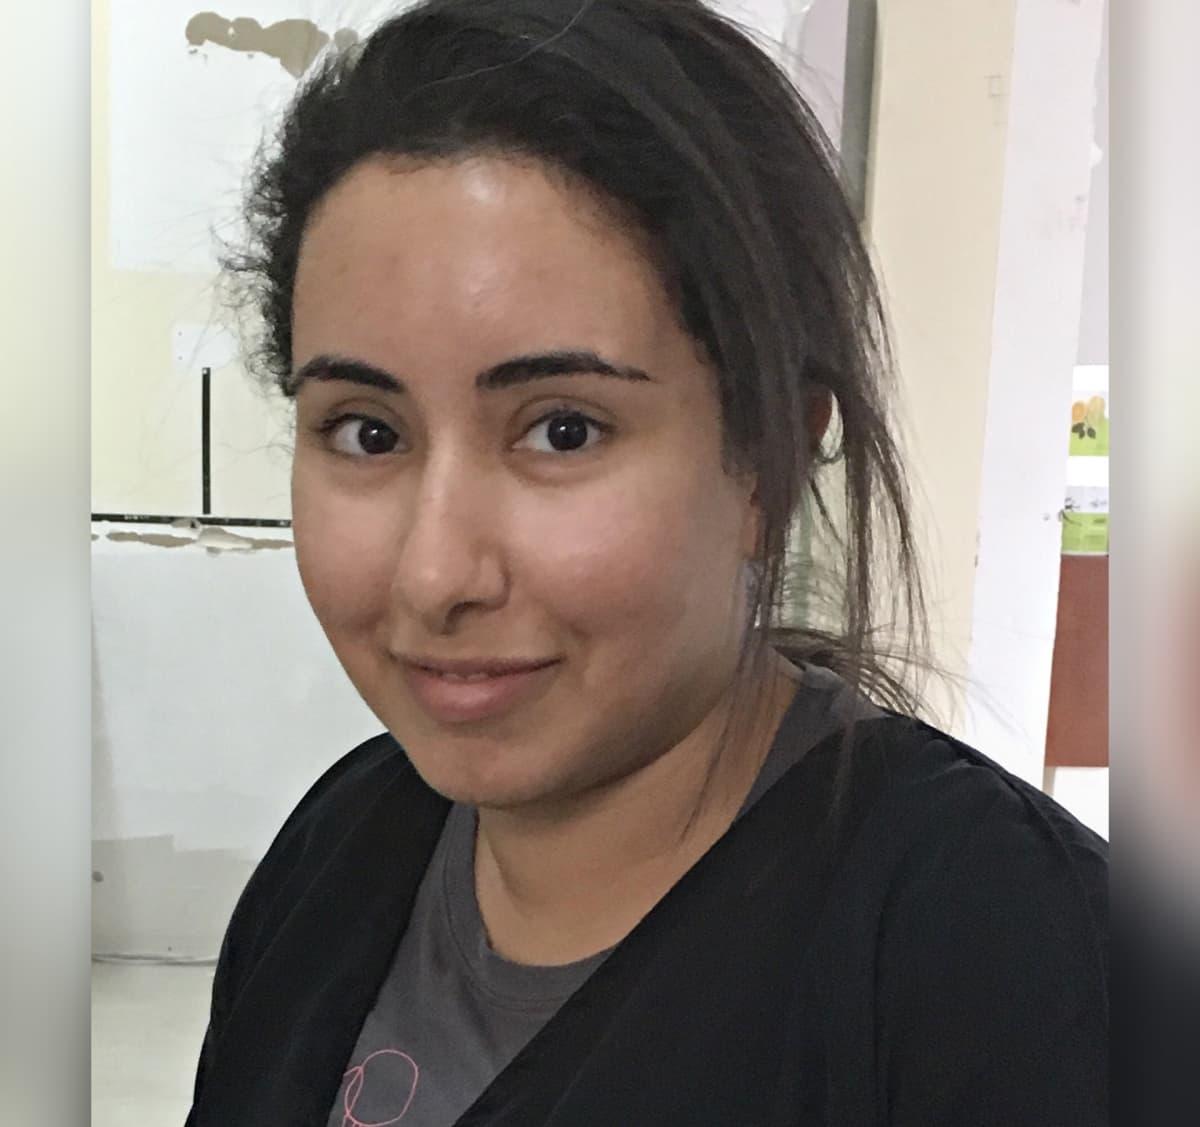 Latifa bint Mohammed bin Rashid Al Maktoum